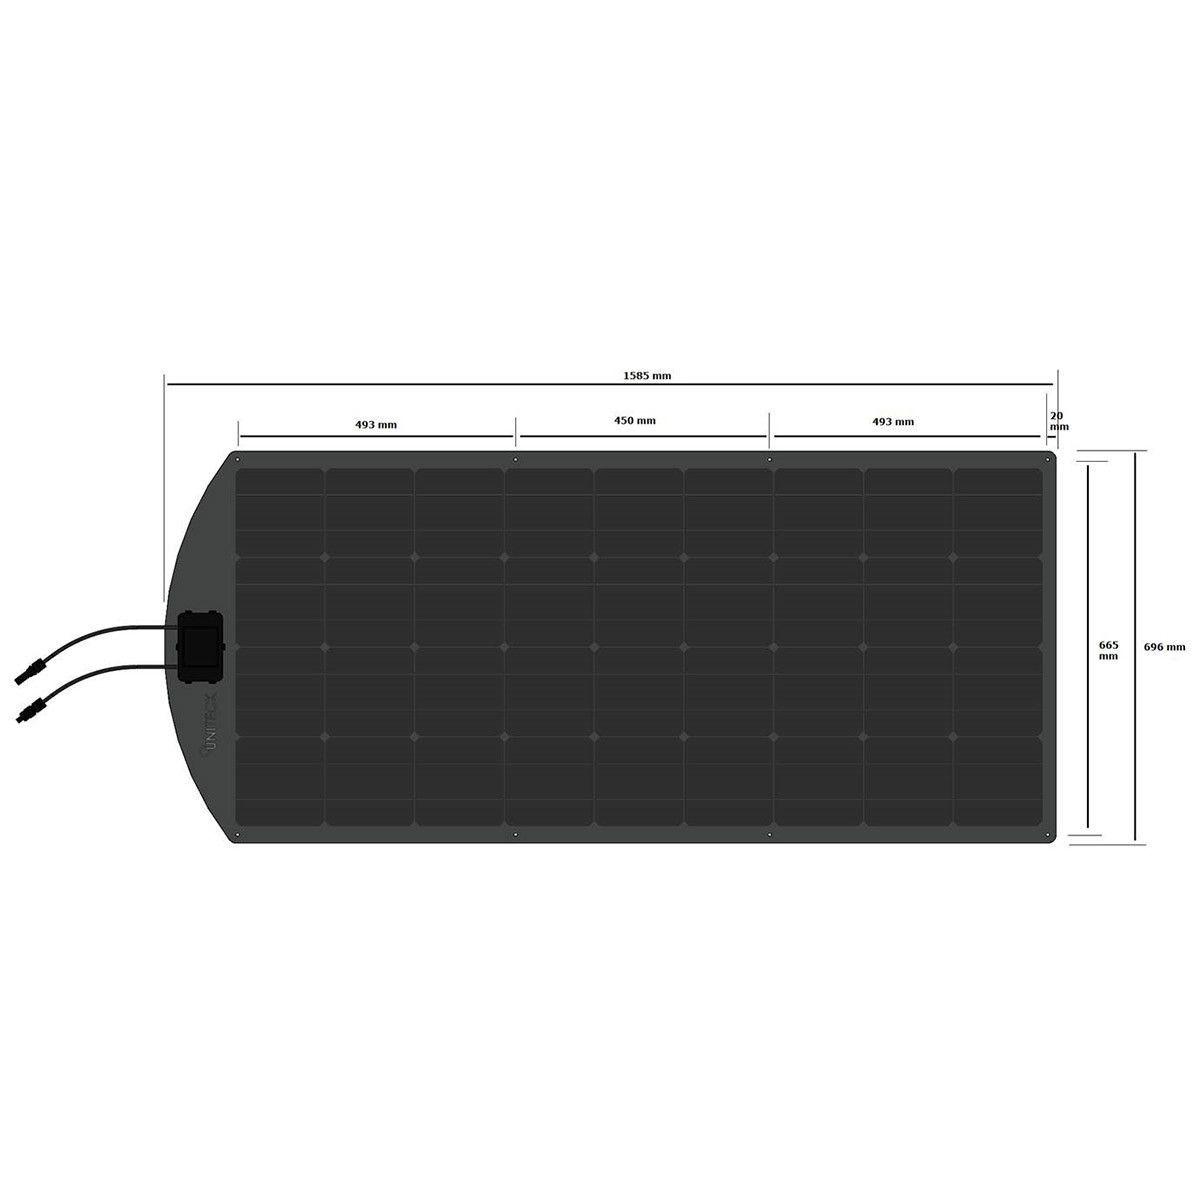 panneau solaire flexible unisun mf monocristallin uniteck. Black Bedroom Furniture Sets. Home Design Ideas